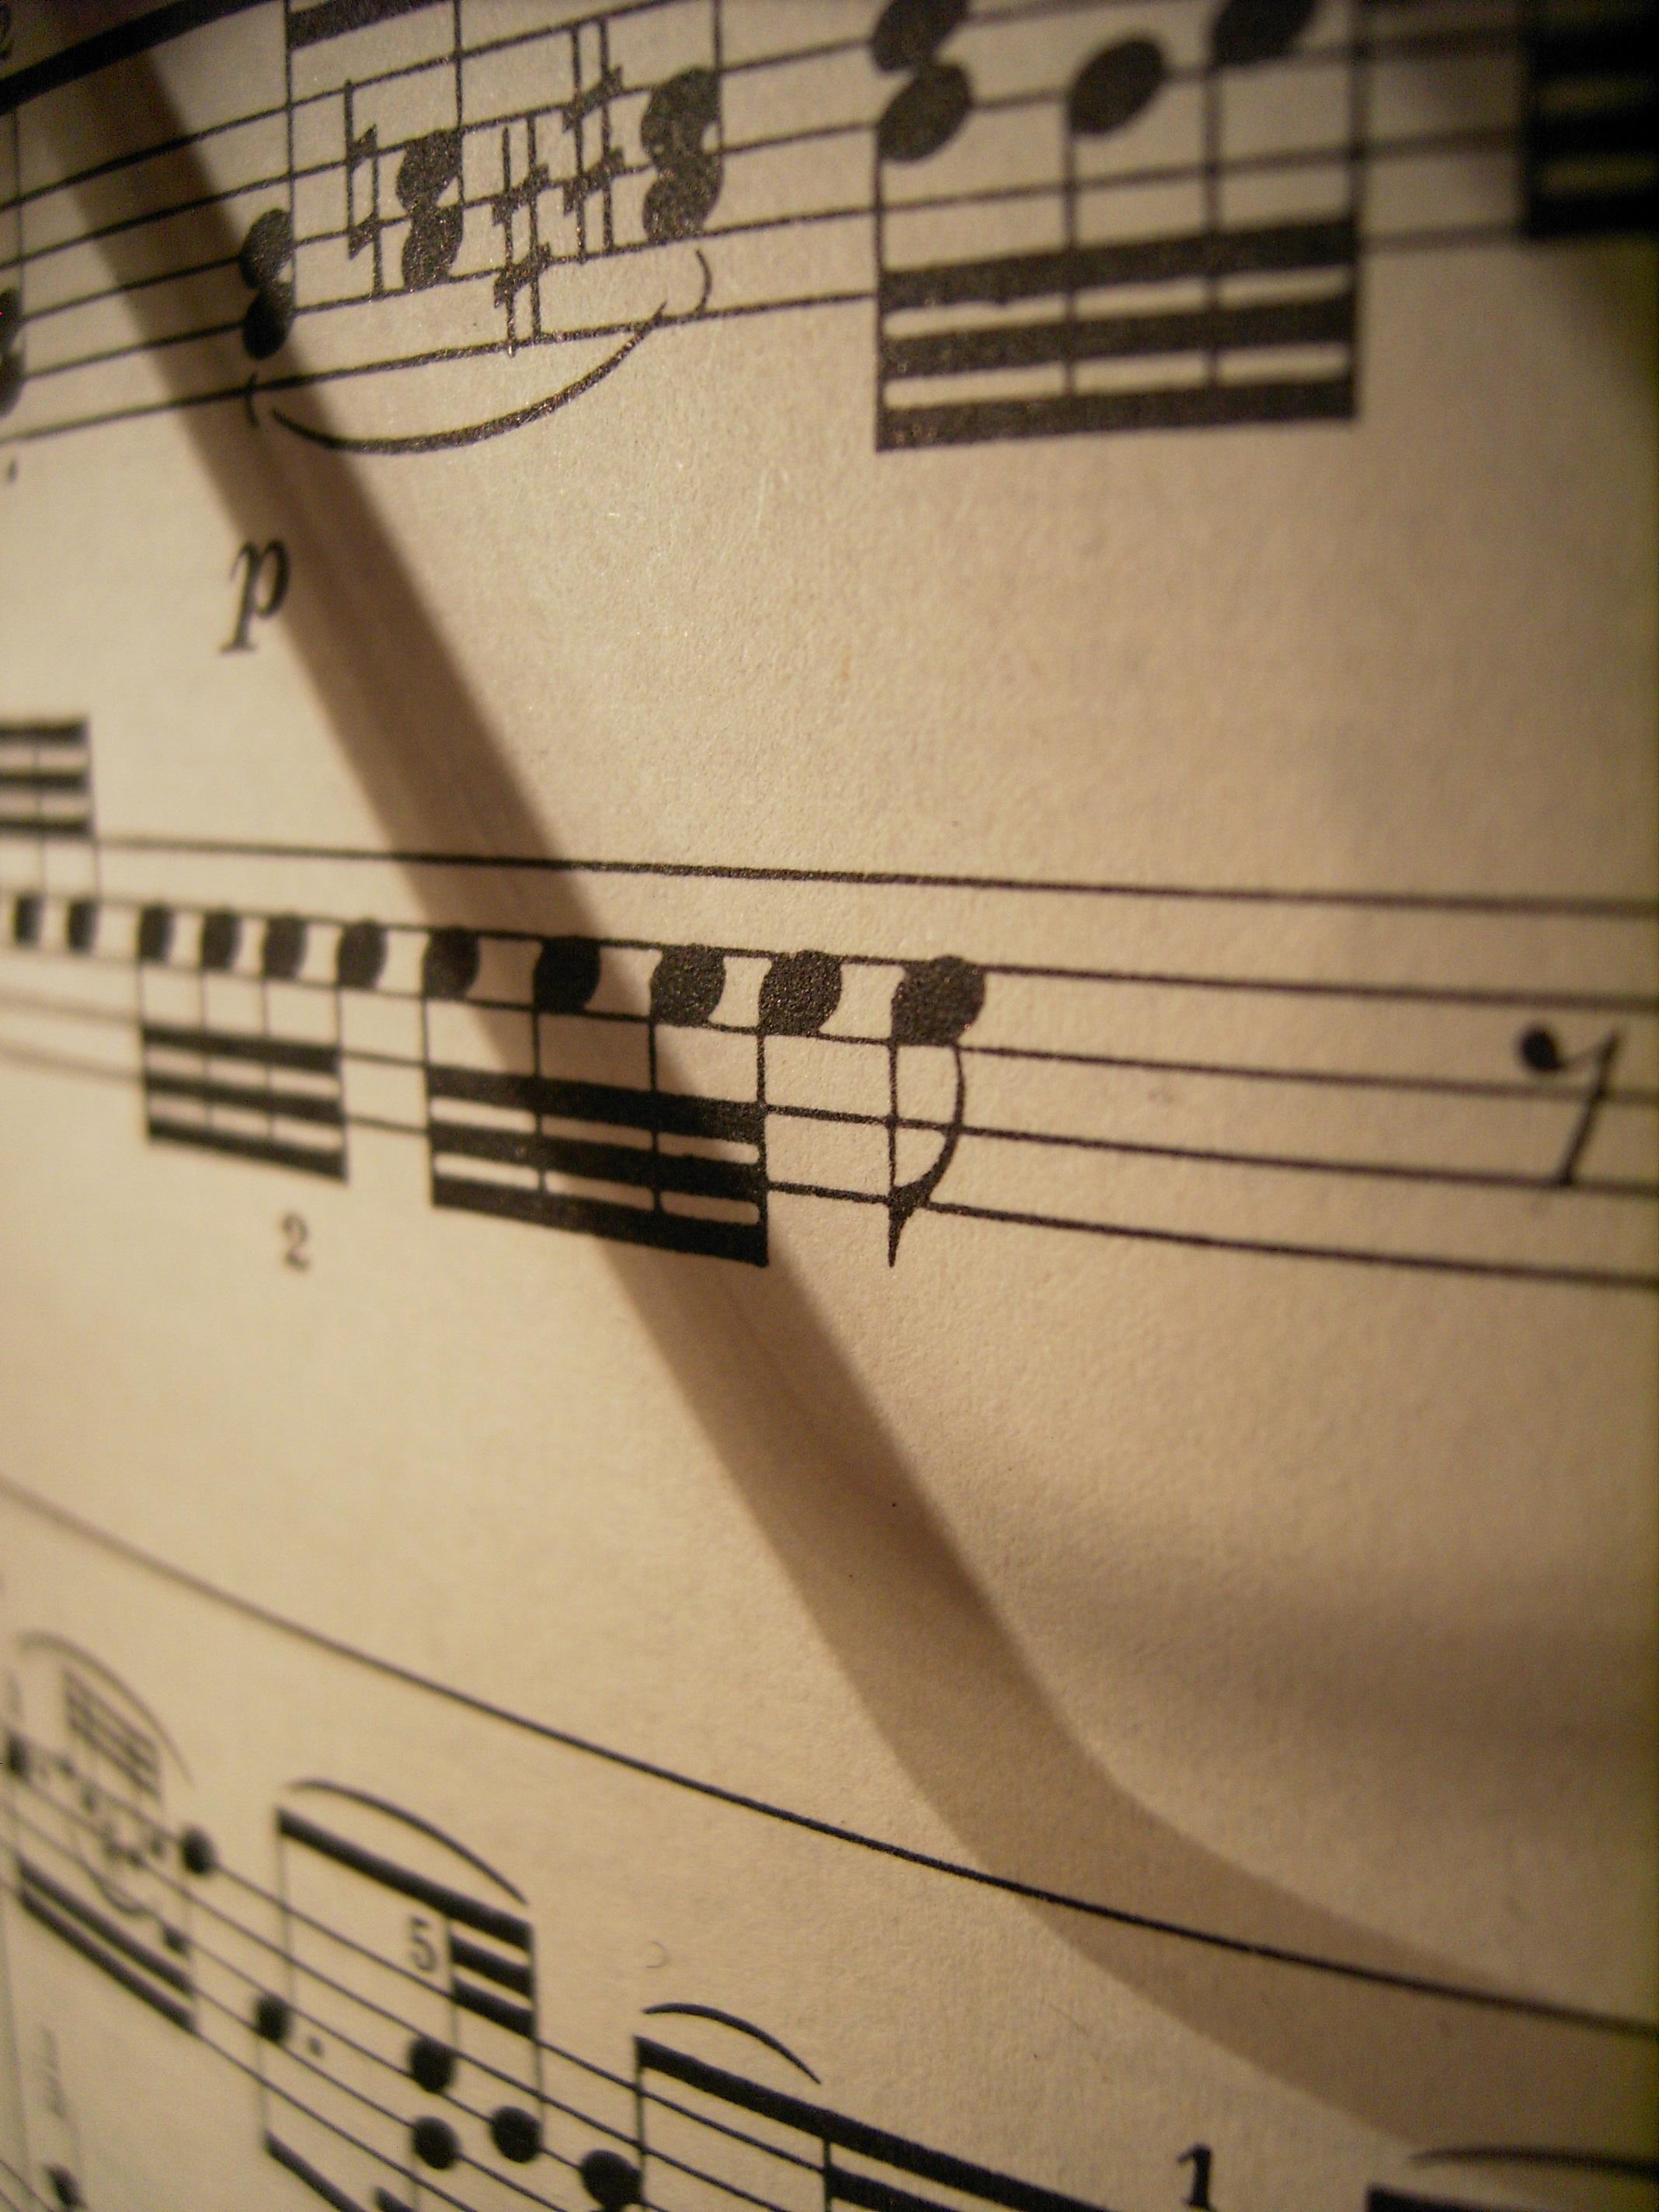 Отрывистая игра пианиста